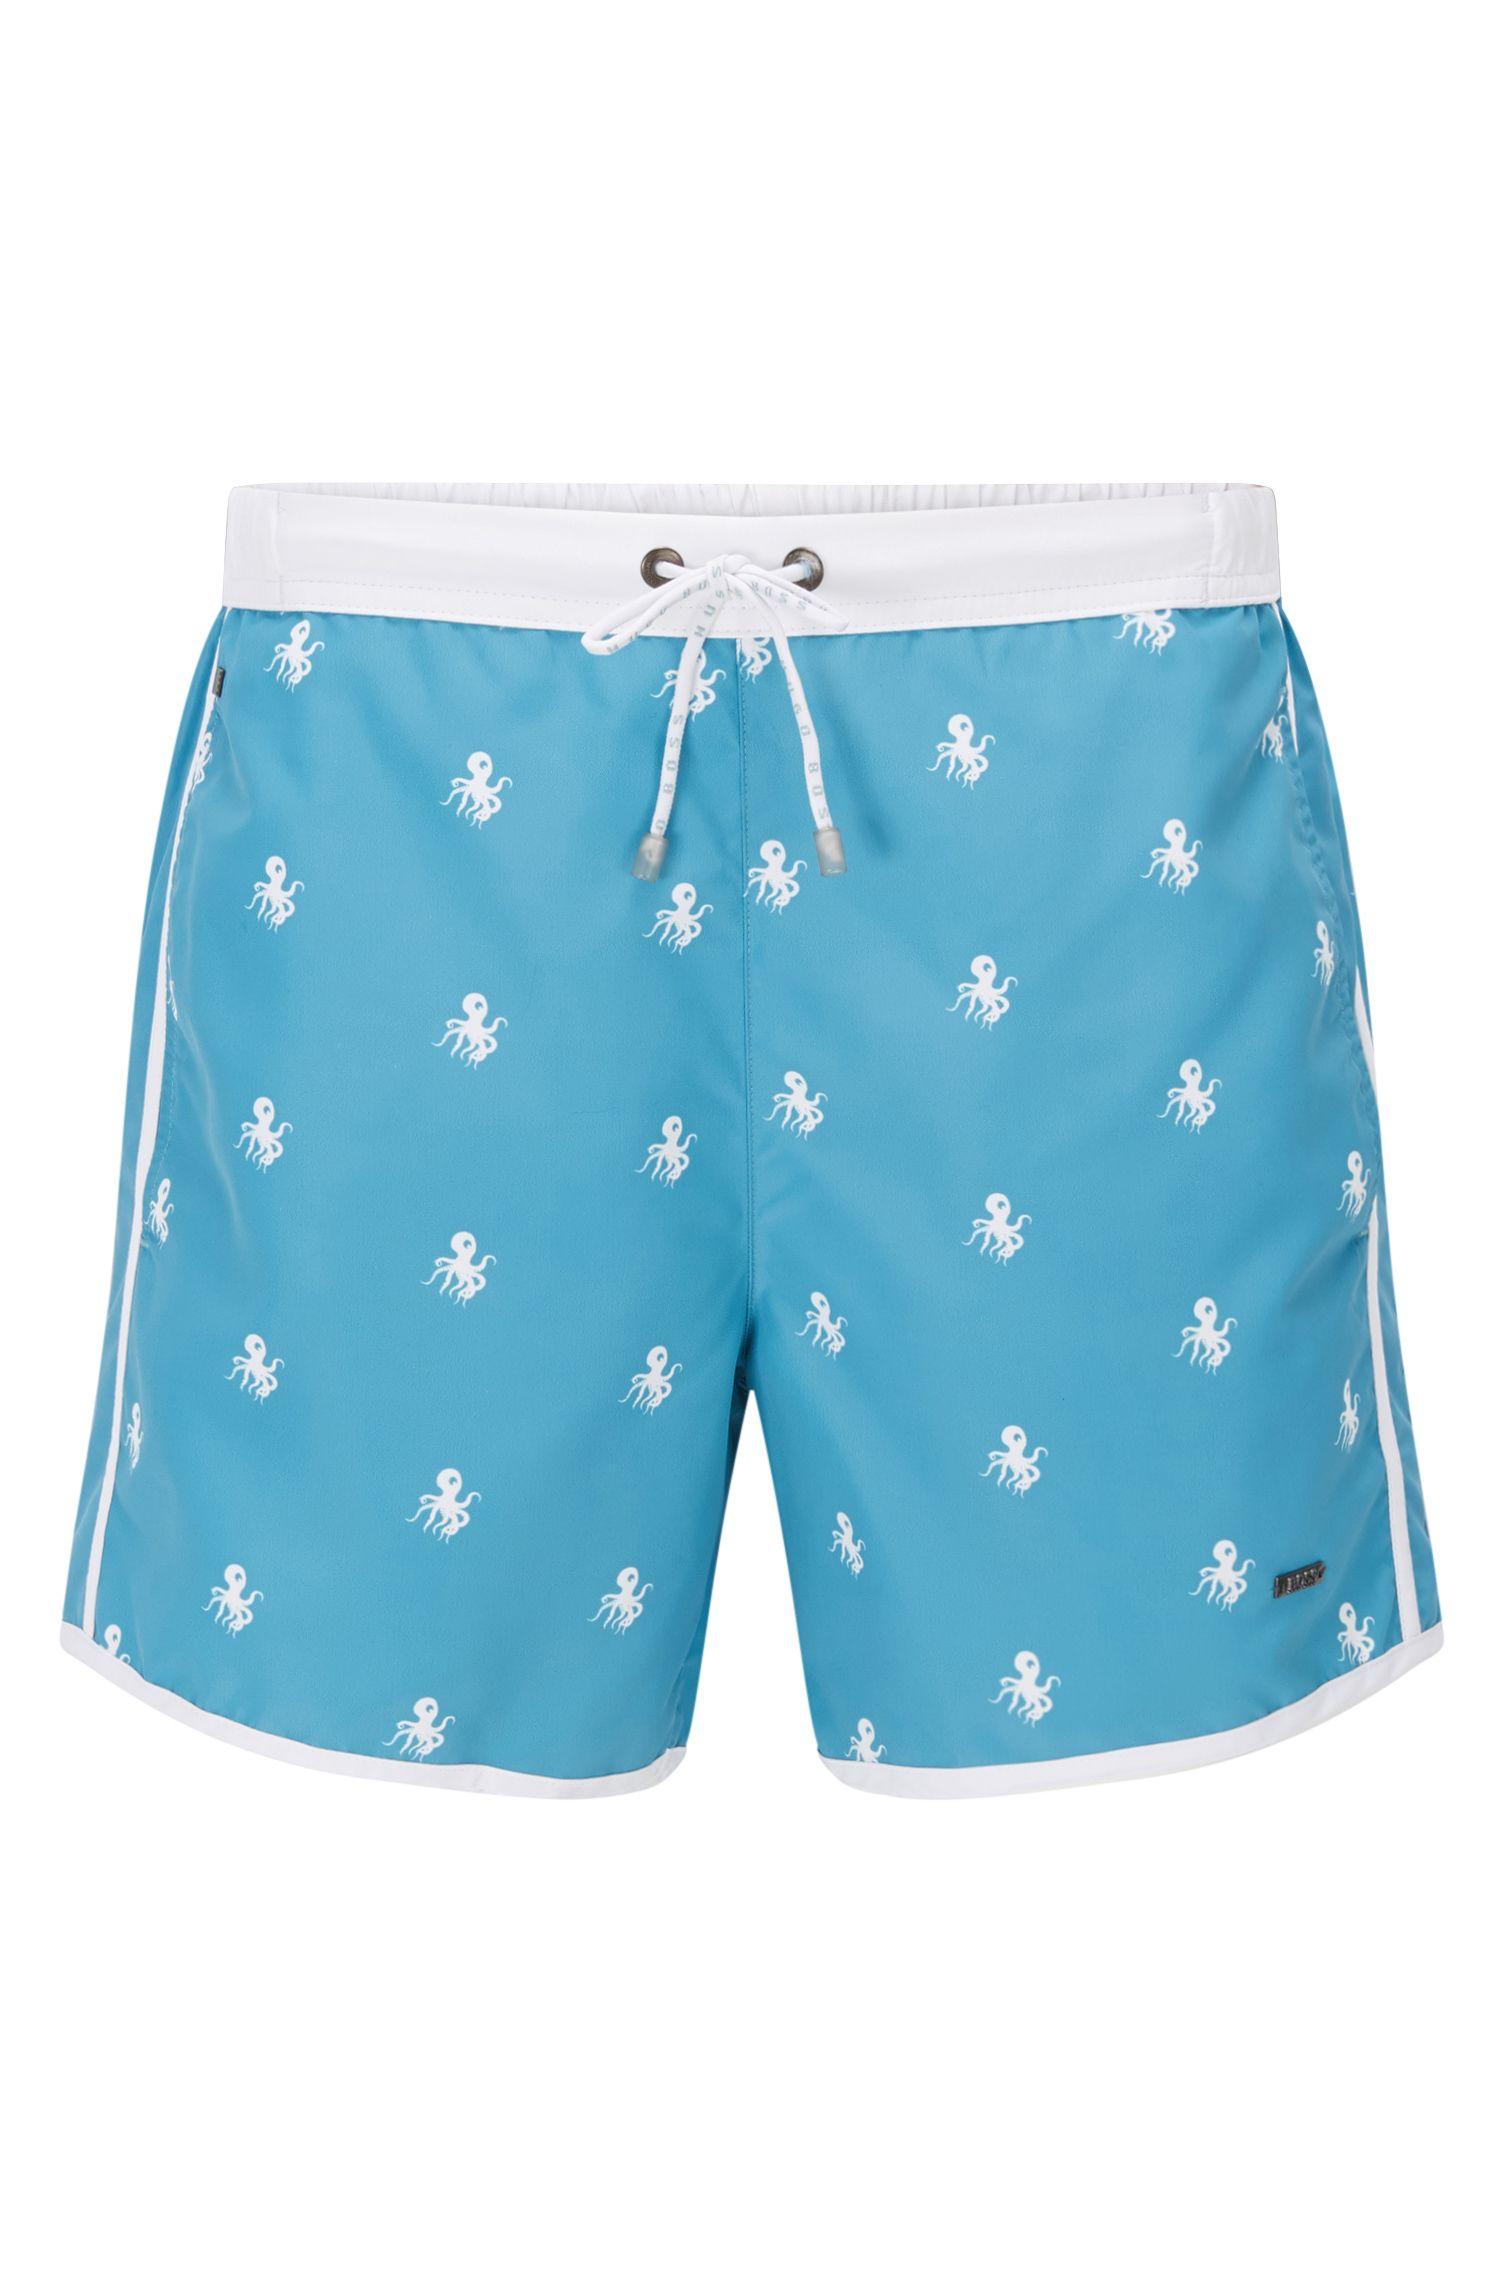 Quick Dry Nylon Embroidered Swim Shorts   White Shark